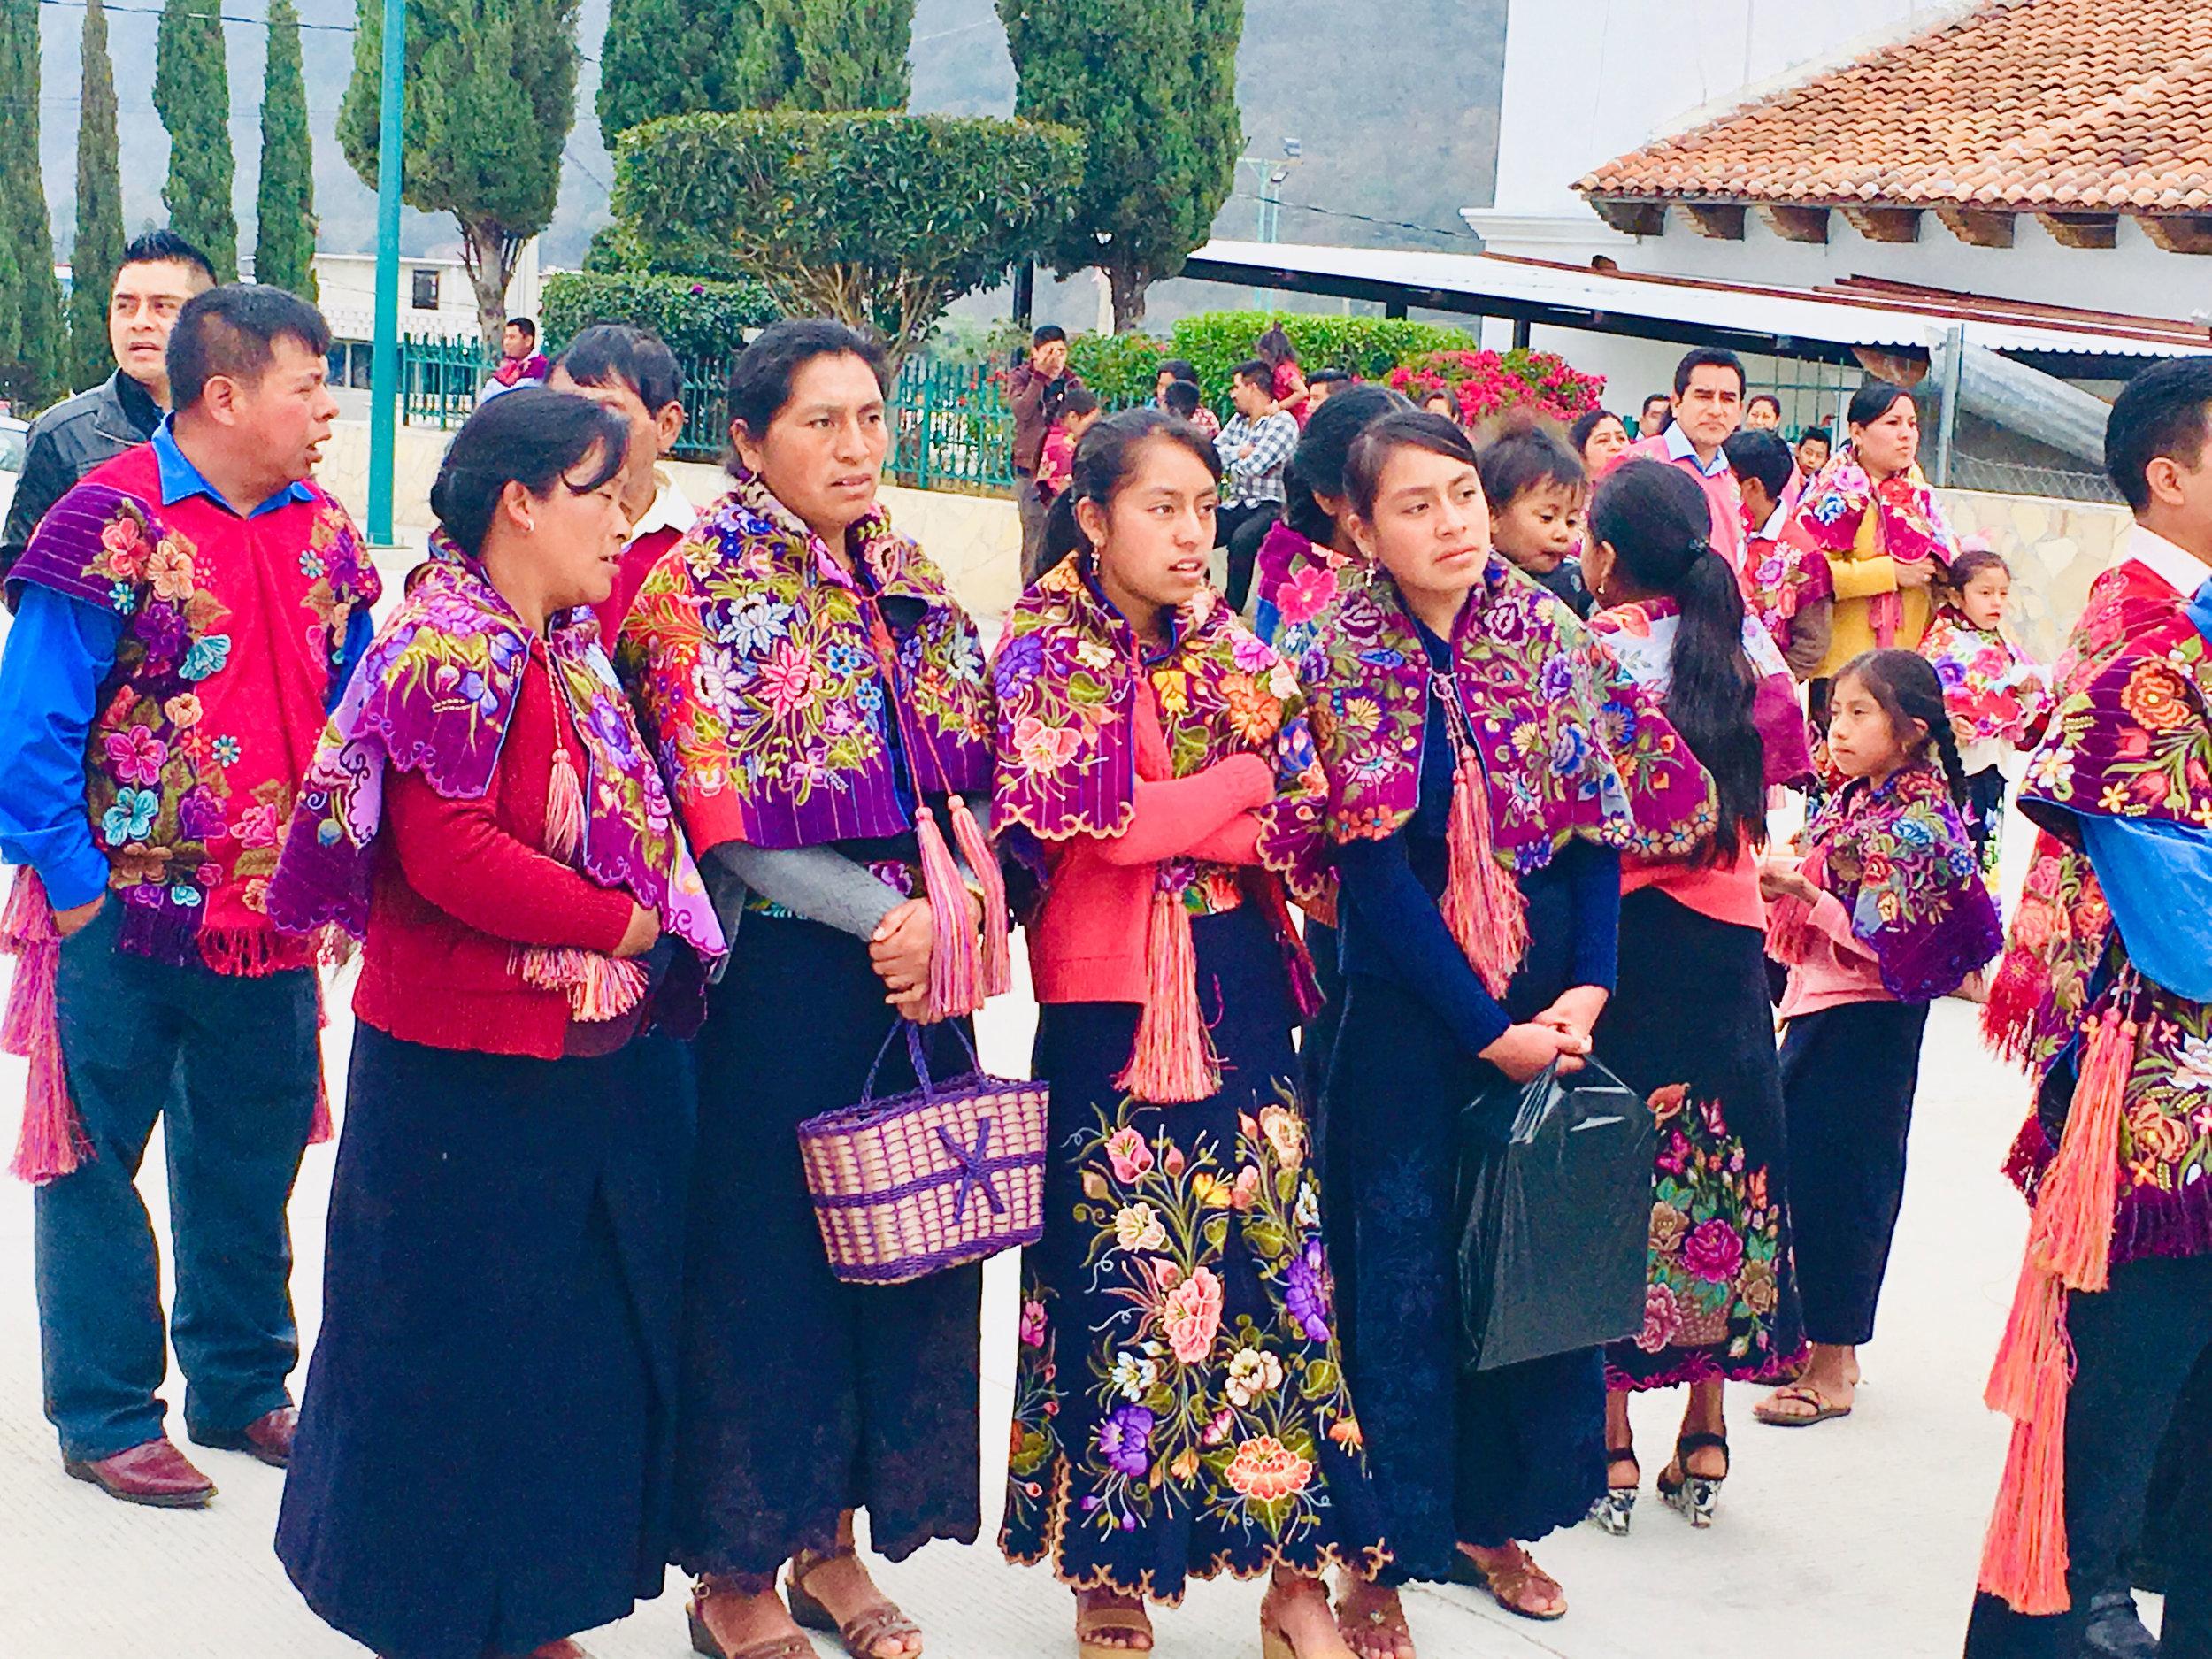 Hammocks_and_Ruins_Blog_People_of_Mexico_43.jpg